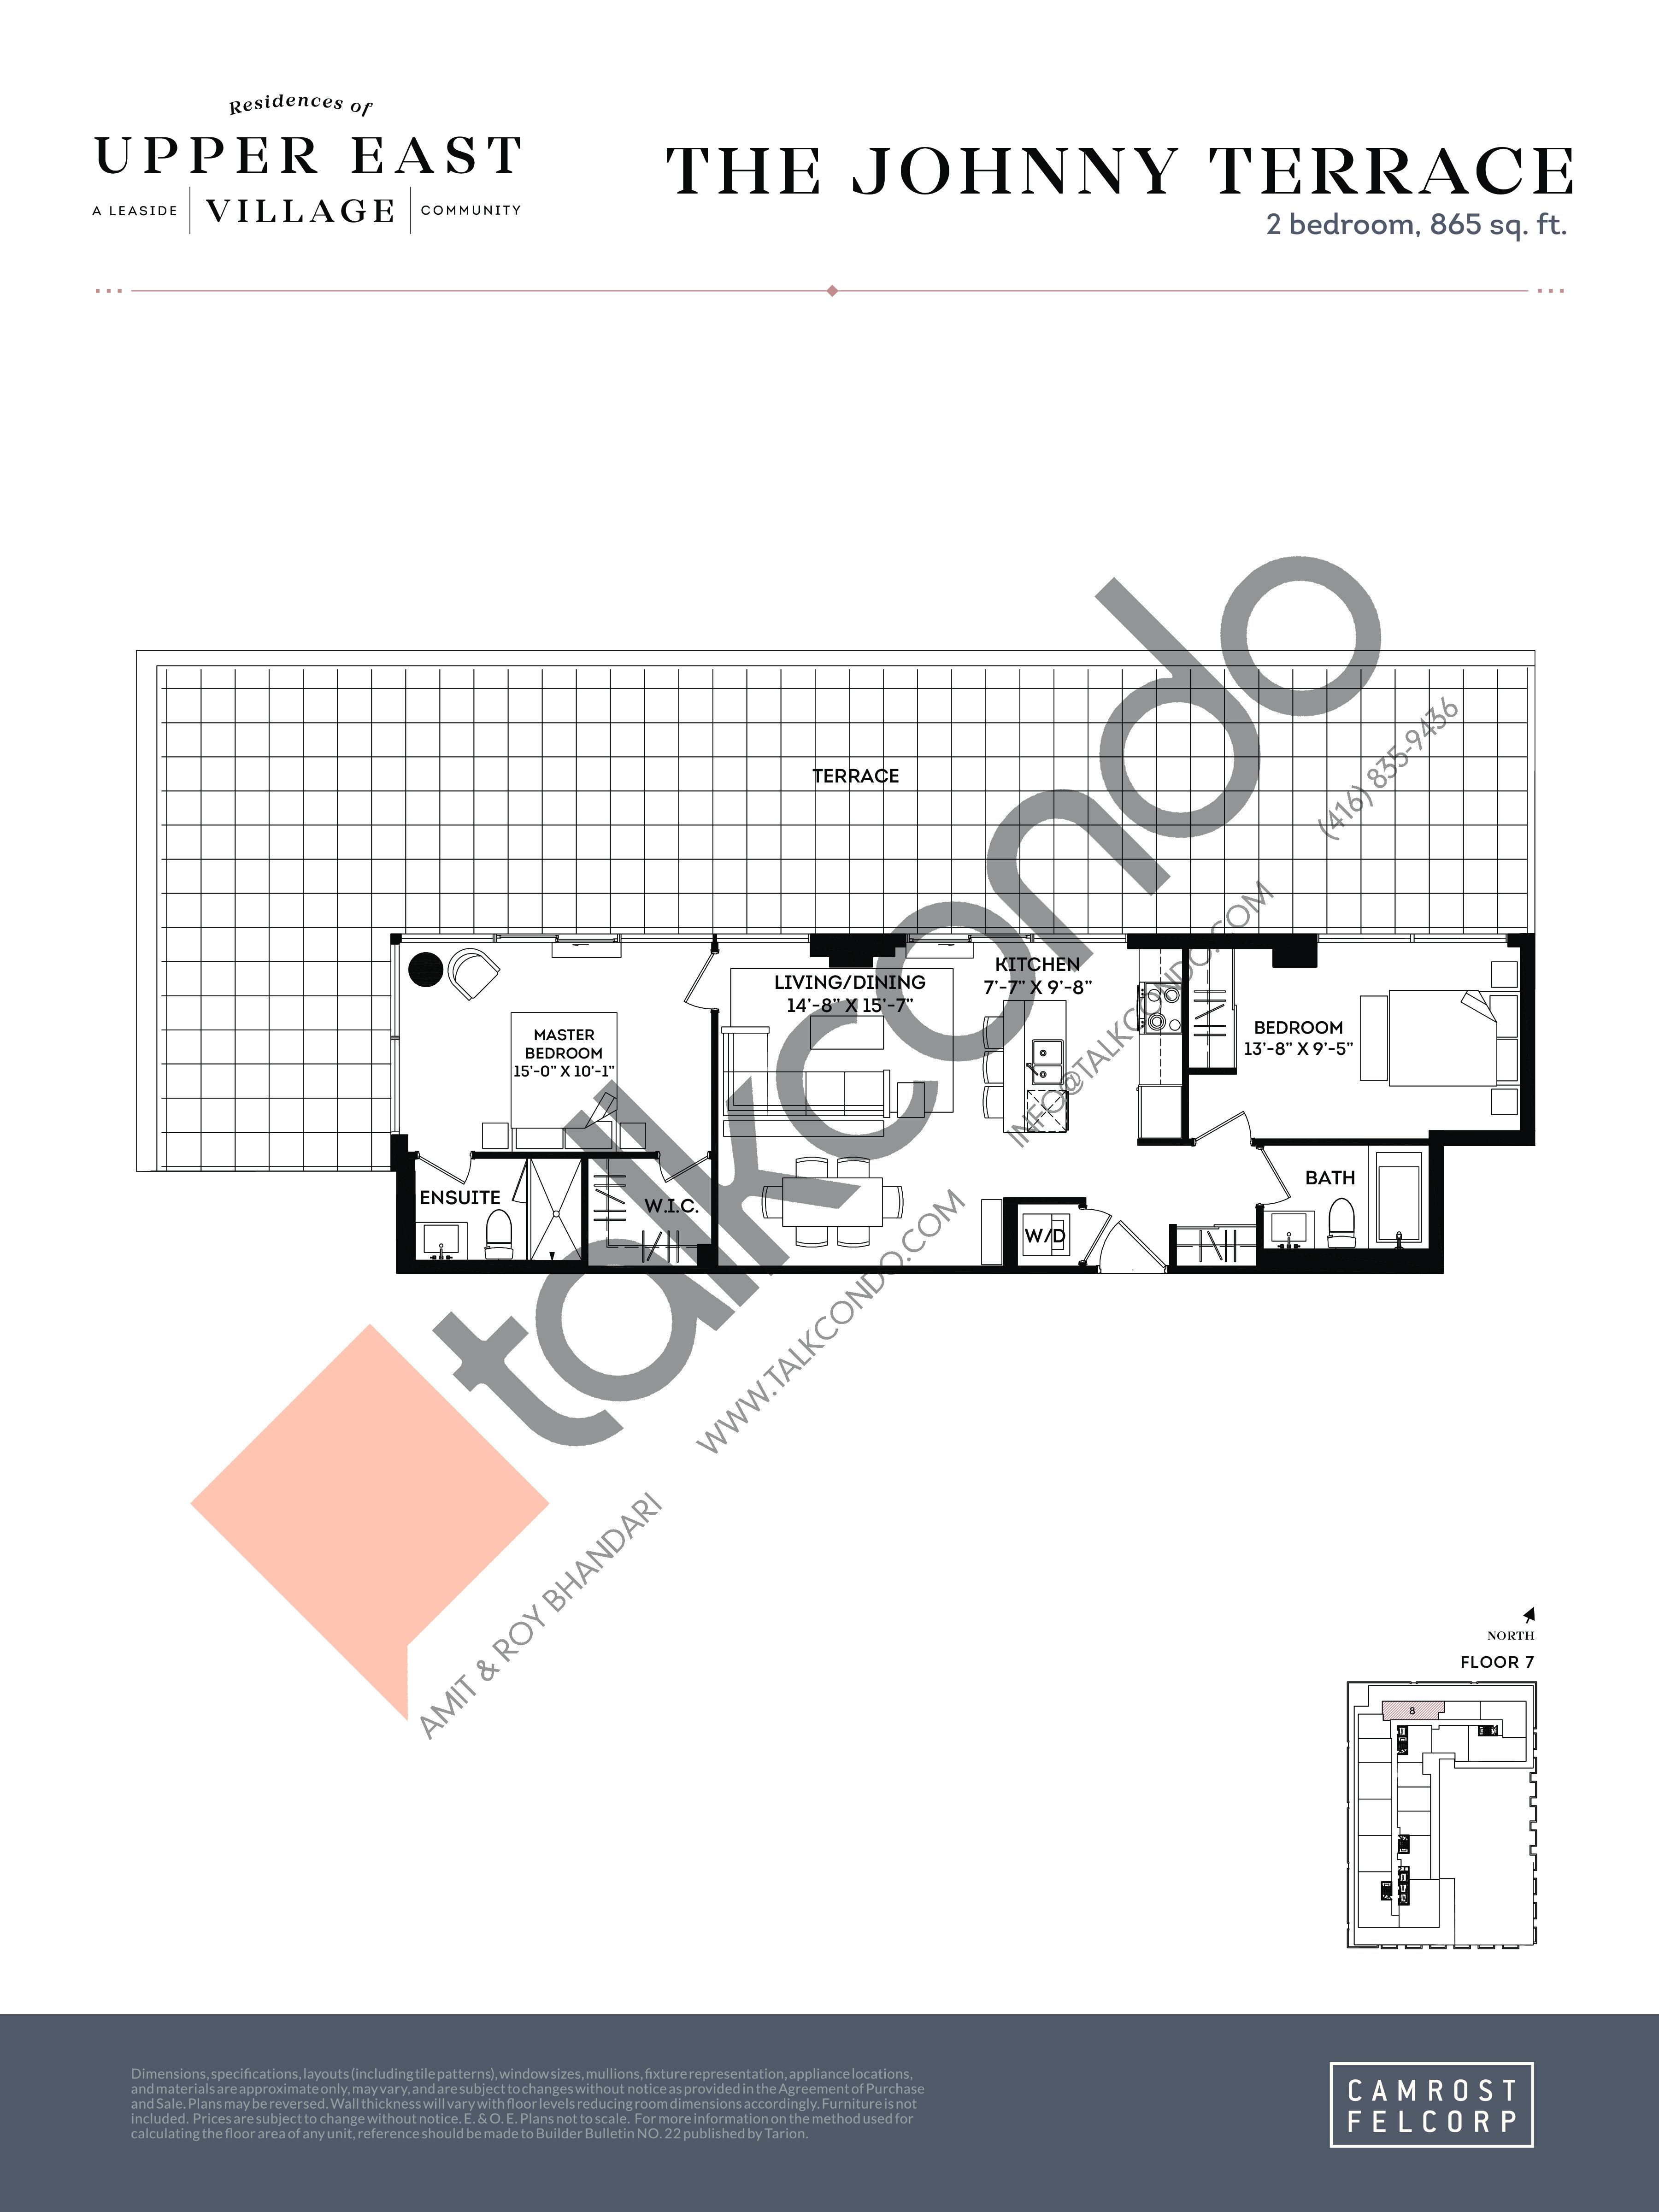 The Johnny Terrace Floor Plan at Upper East Village Condos - 865 sq.ft